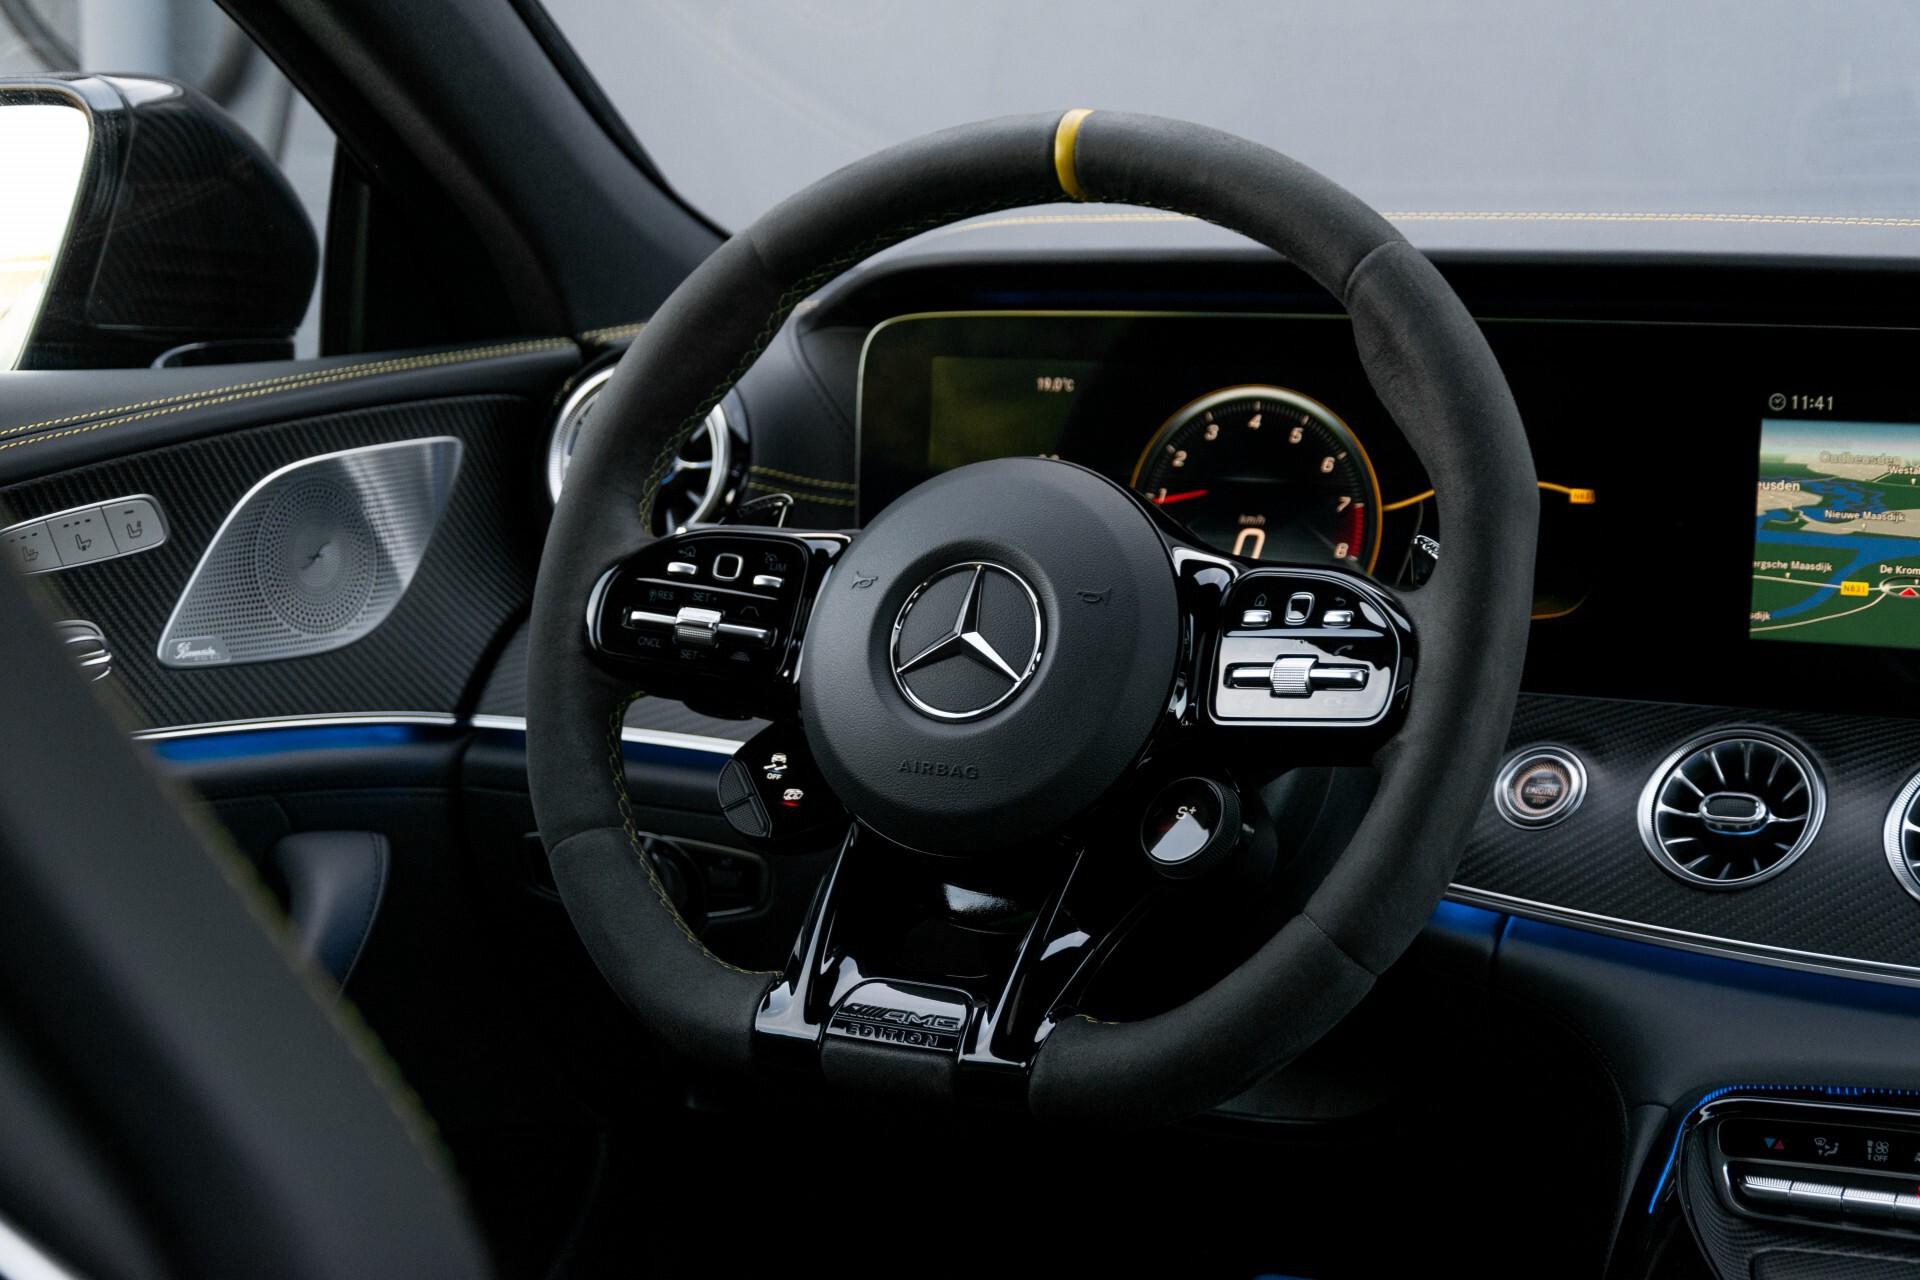 Mercedes-Benz AMG GT 4-Door Coupe 63 S 4MATIC+ Edition 1 Keramisch/Carbon/First Class/Dynamic Plus/Burmester High End 3D Aut9 Foto 8